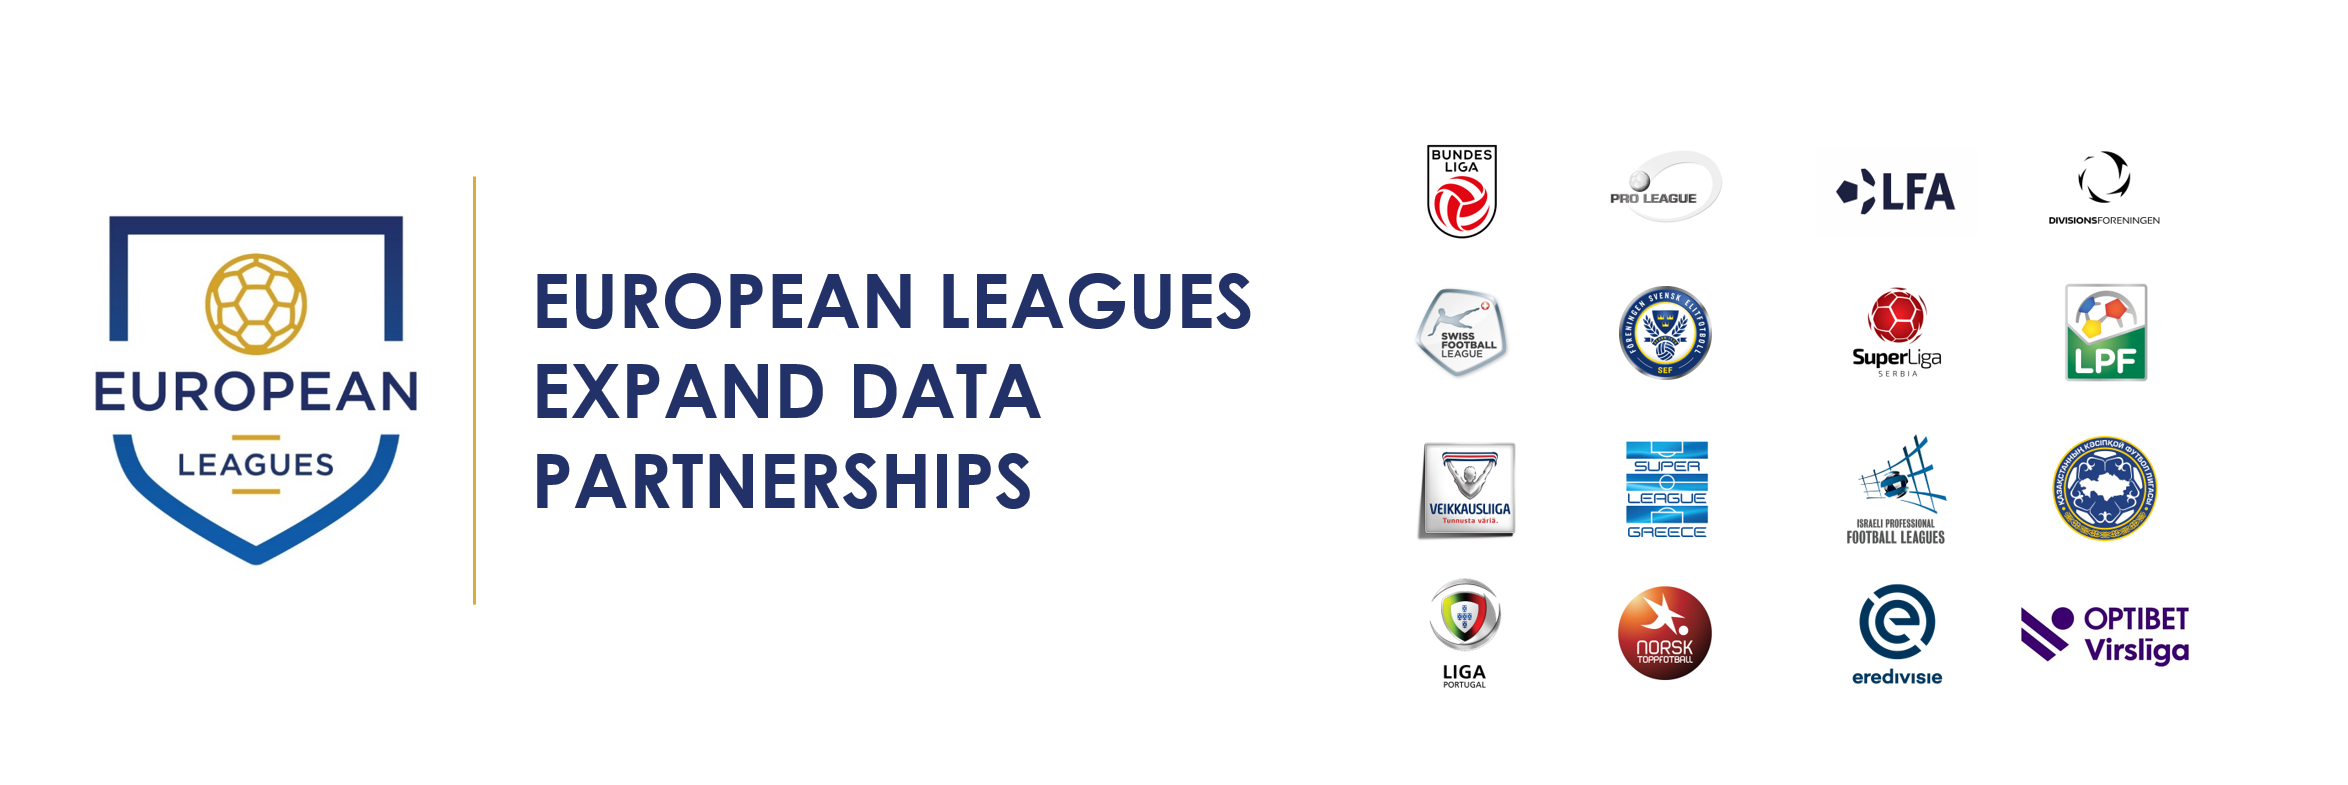 Football stats european leagues betting bene league betting